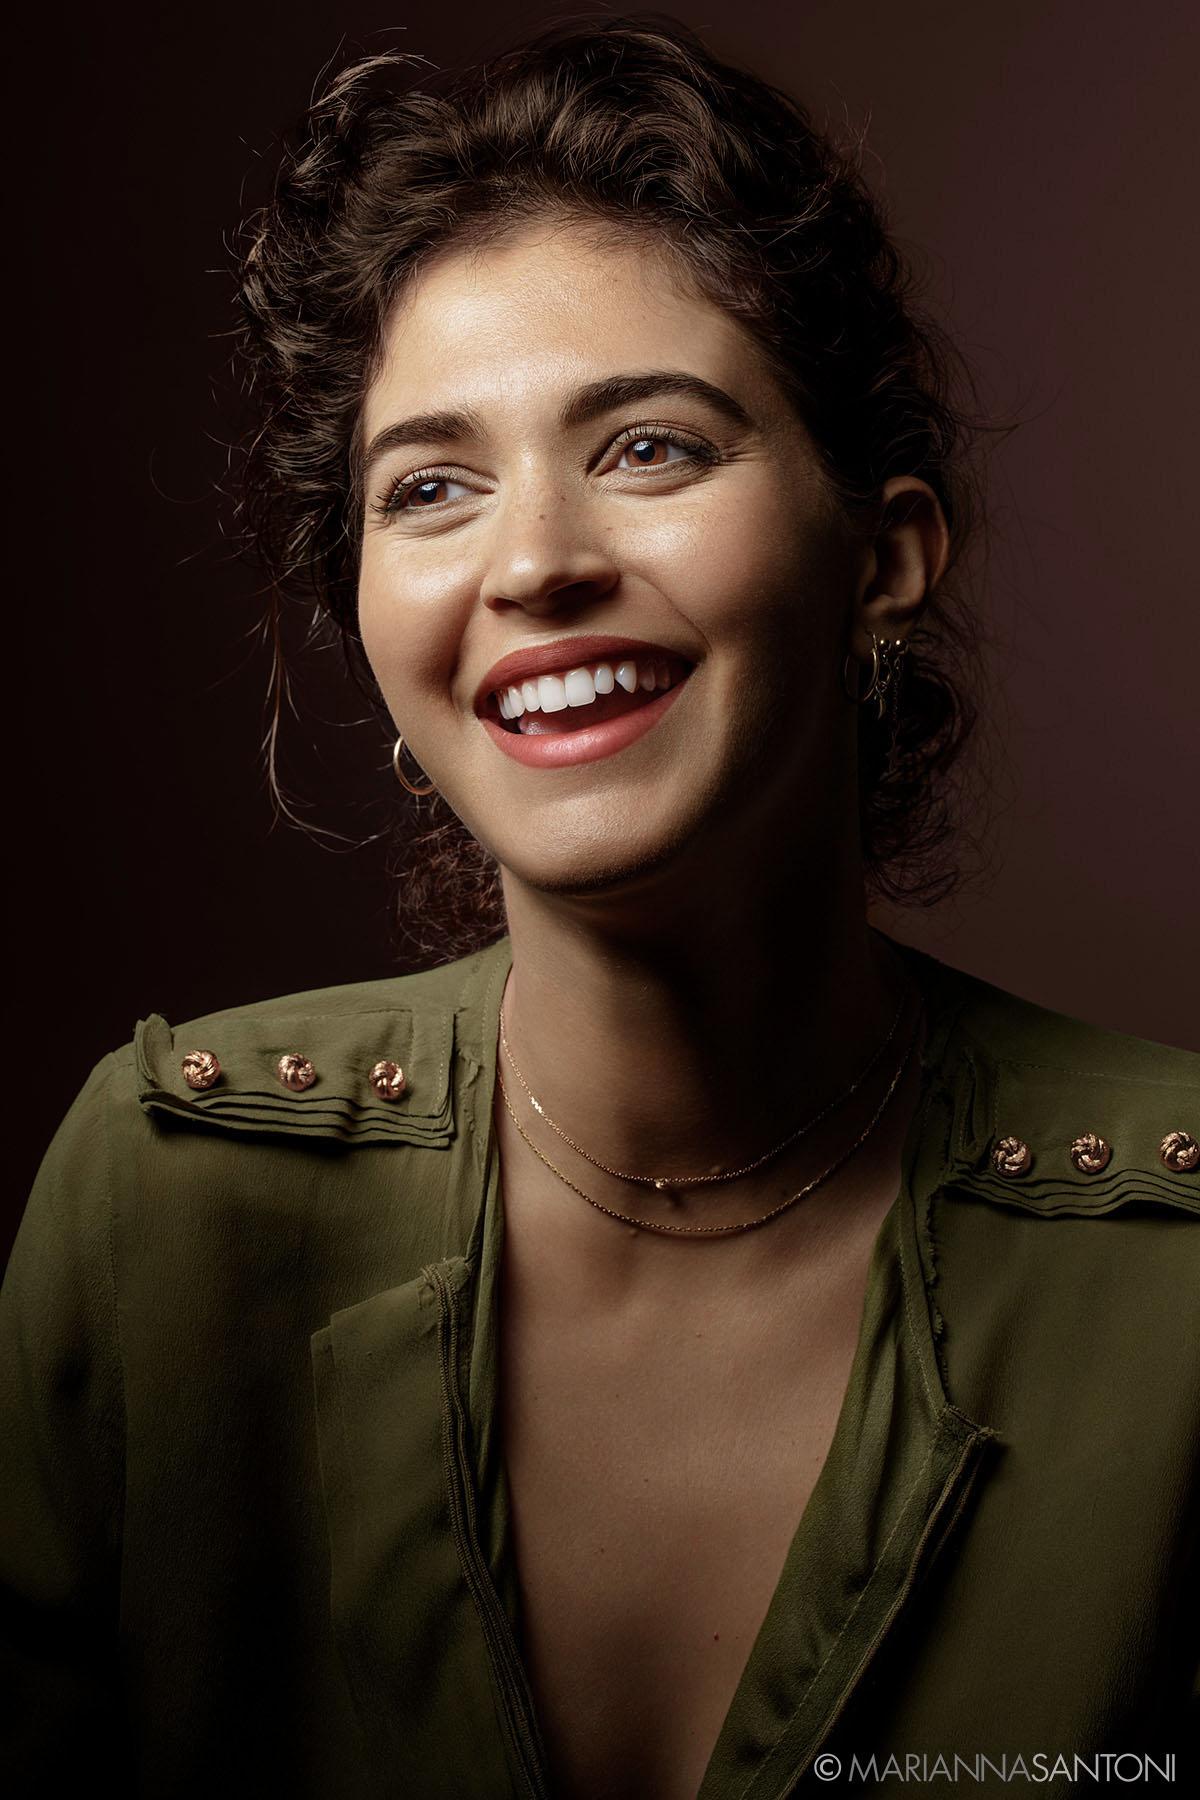 portrait of the model Selene Gnavolini shot by photographer marianna santoni